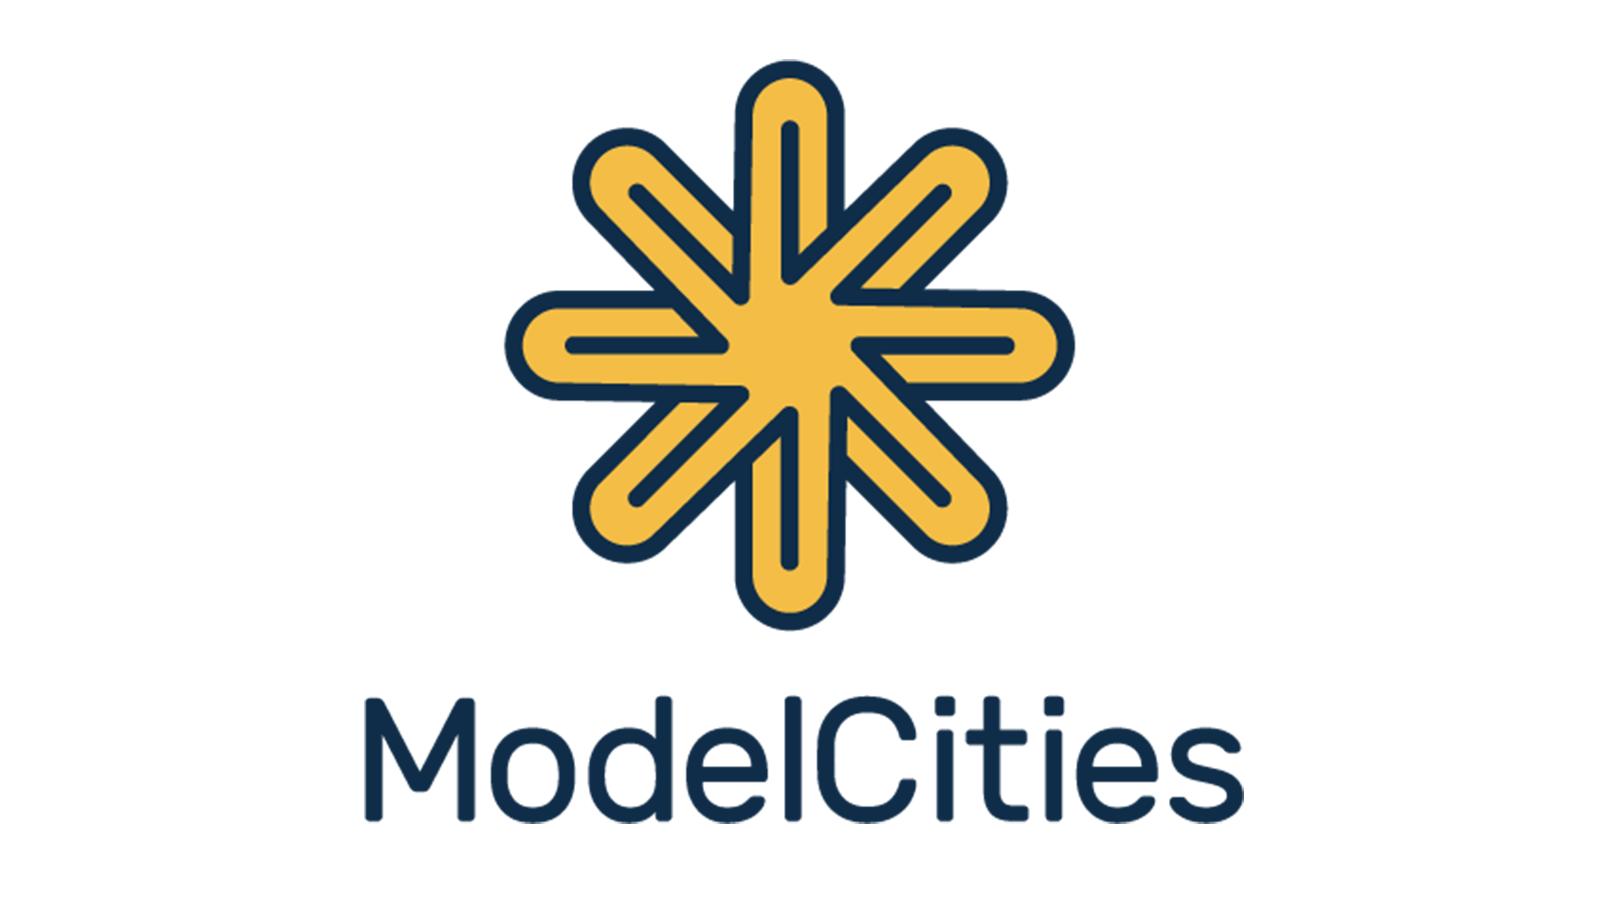 ModelCities logo